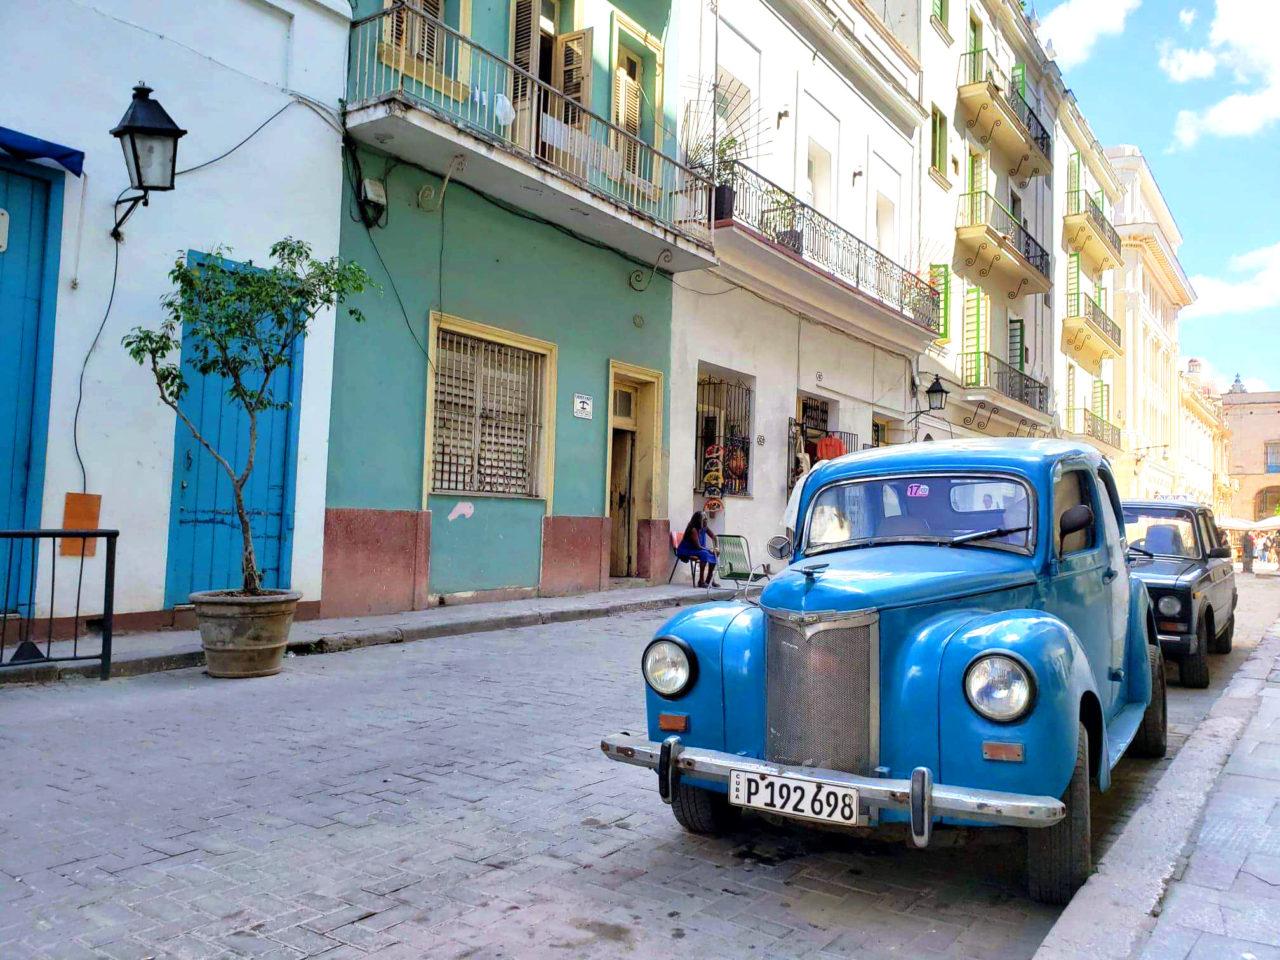 Vintage car in Havana, Cuba